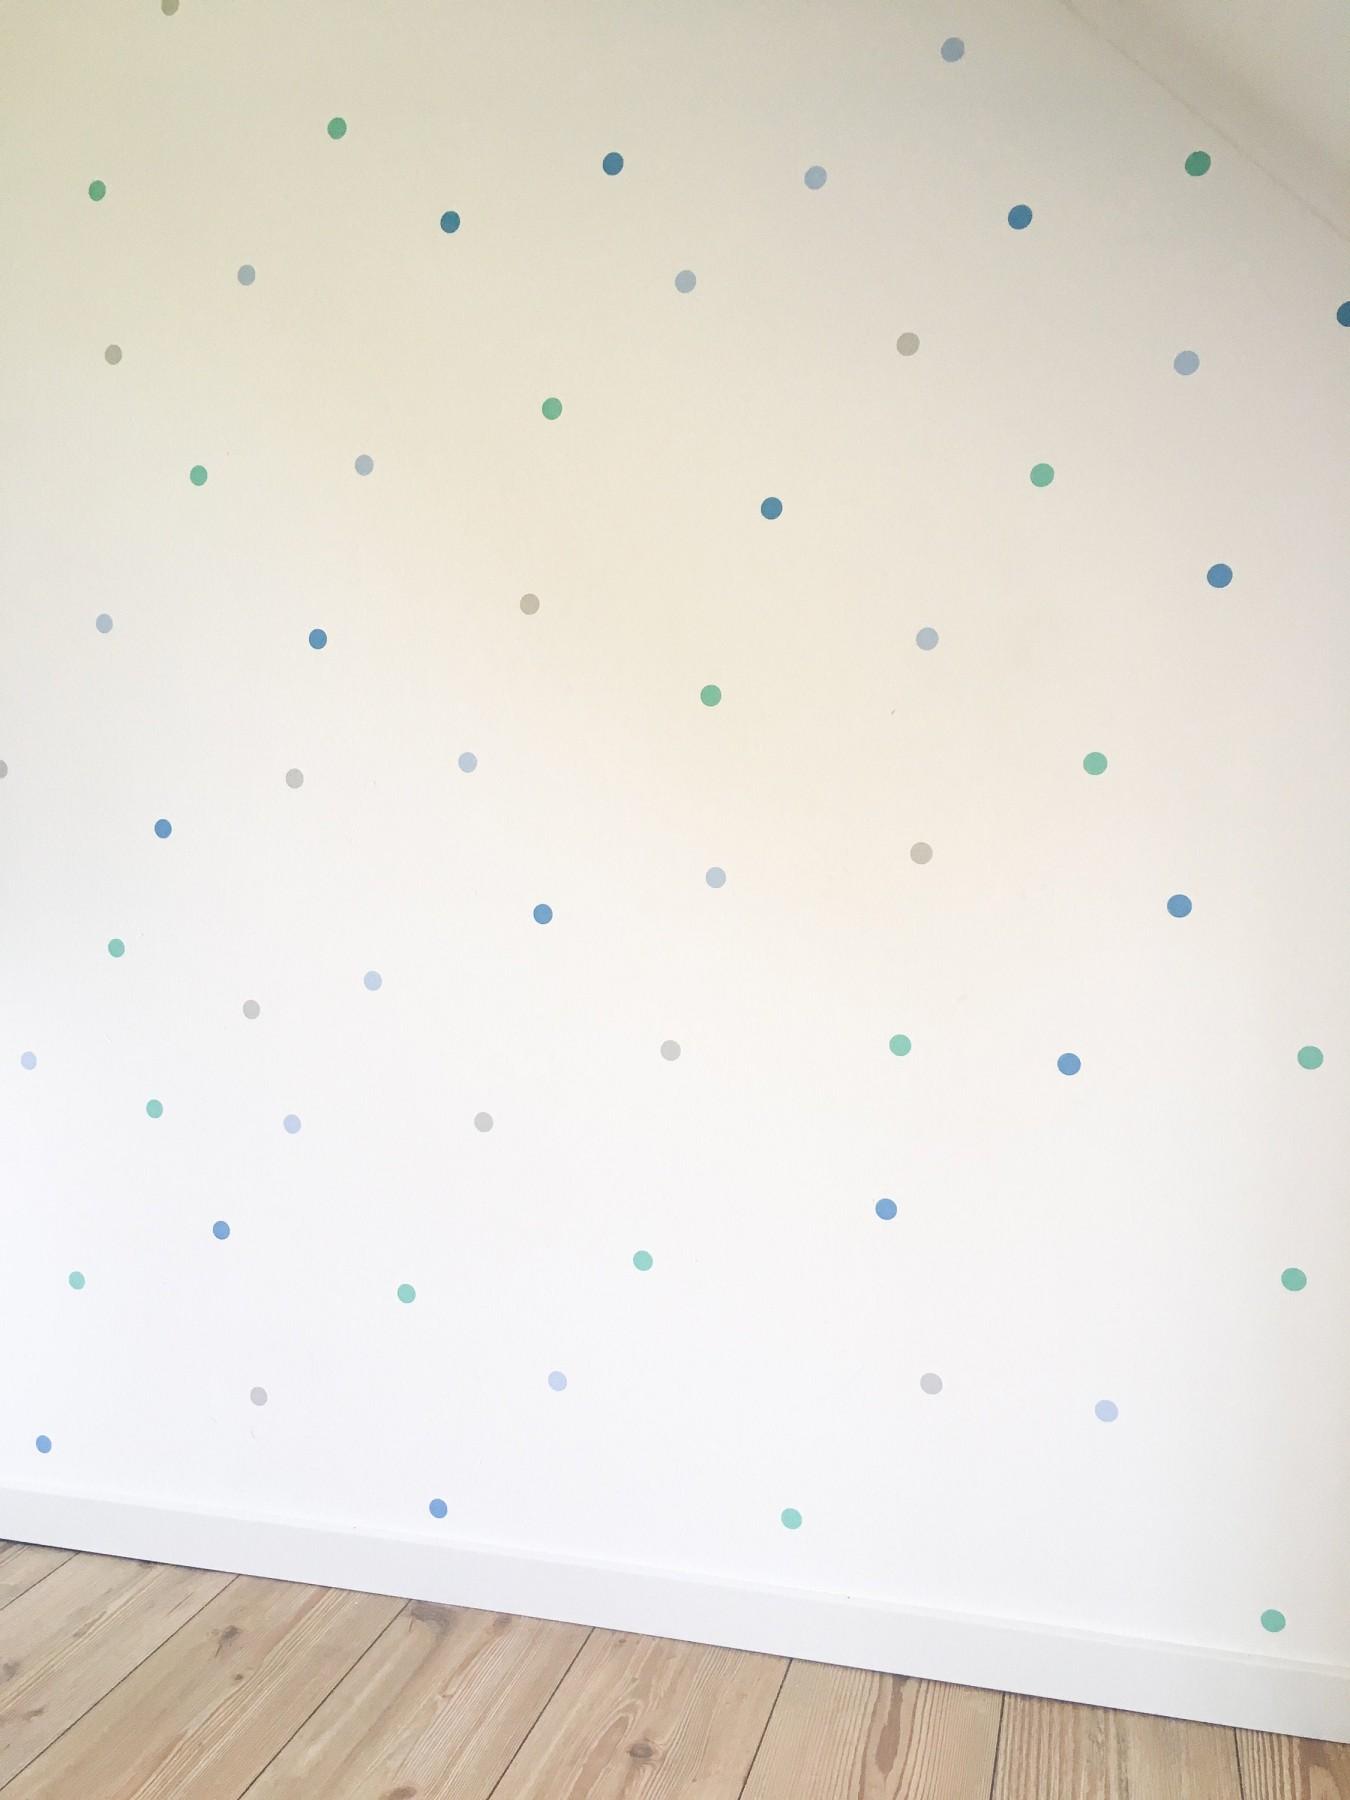 Full Size of Kinderzimmer Wanddeko Wanddekoration Wandtattoo Punkte Regal Weiß Sofa Küche Regale Kinderzimmer Kinderzimmer Wanddeko